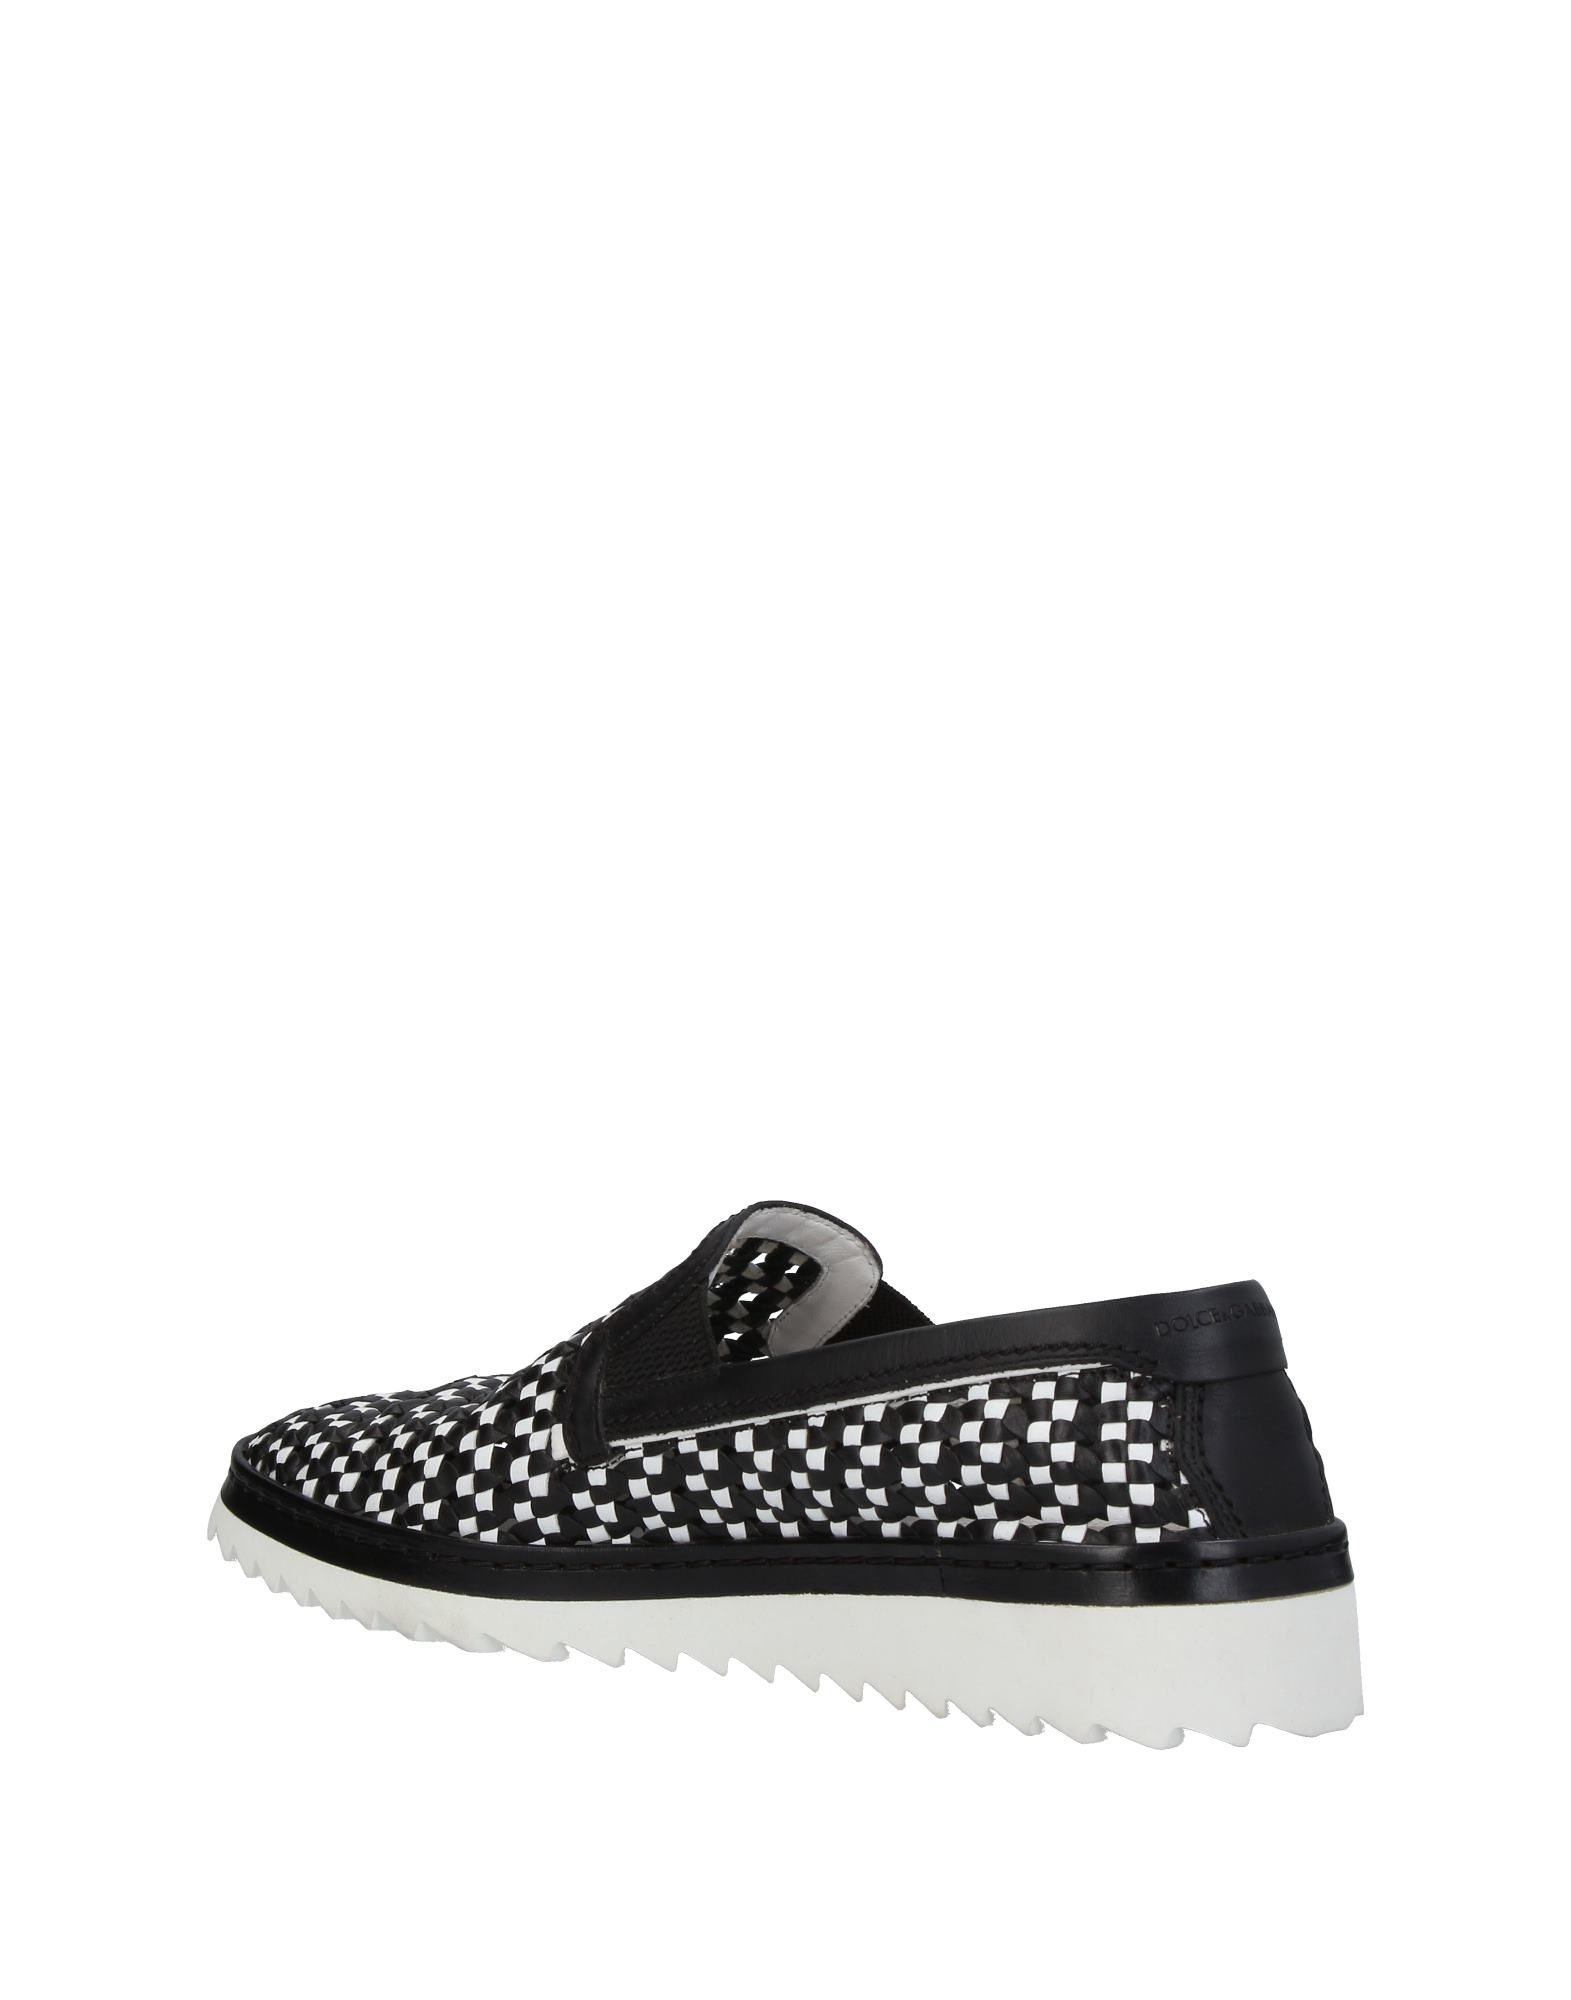 Dolce & Gabbana Sneakers Herren  11409862QF Gute Qualität beliebte Schuhe